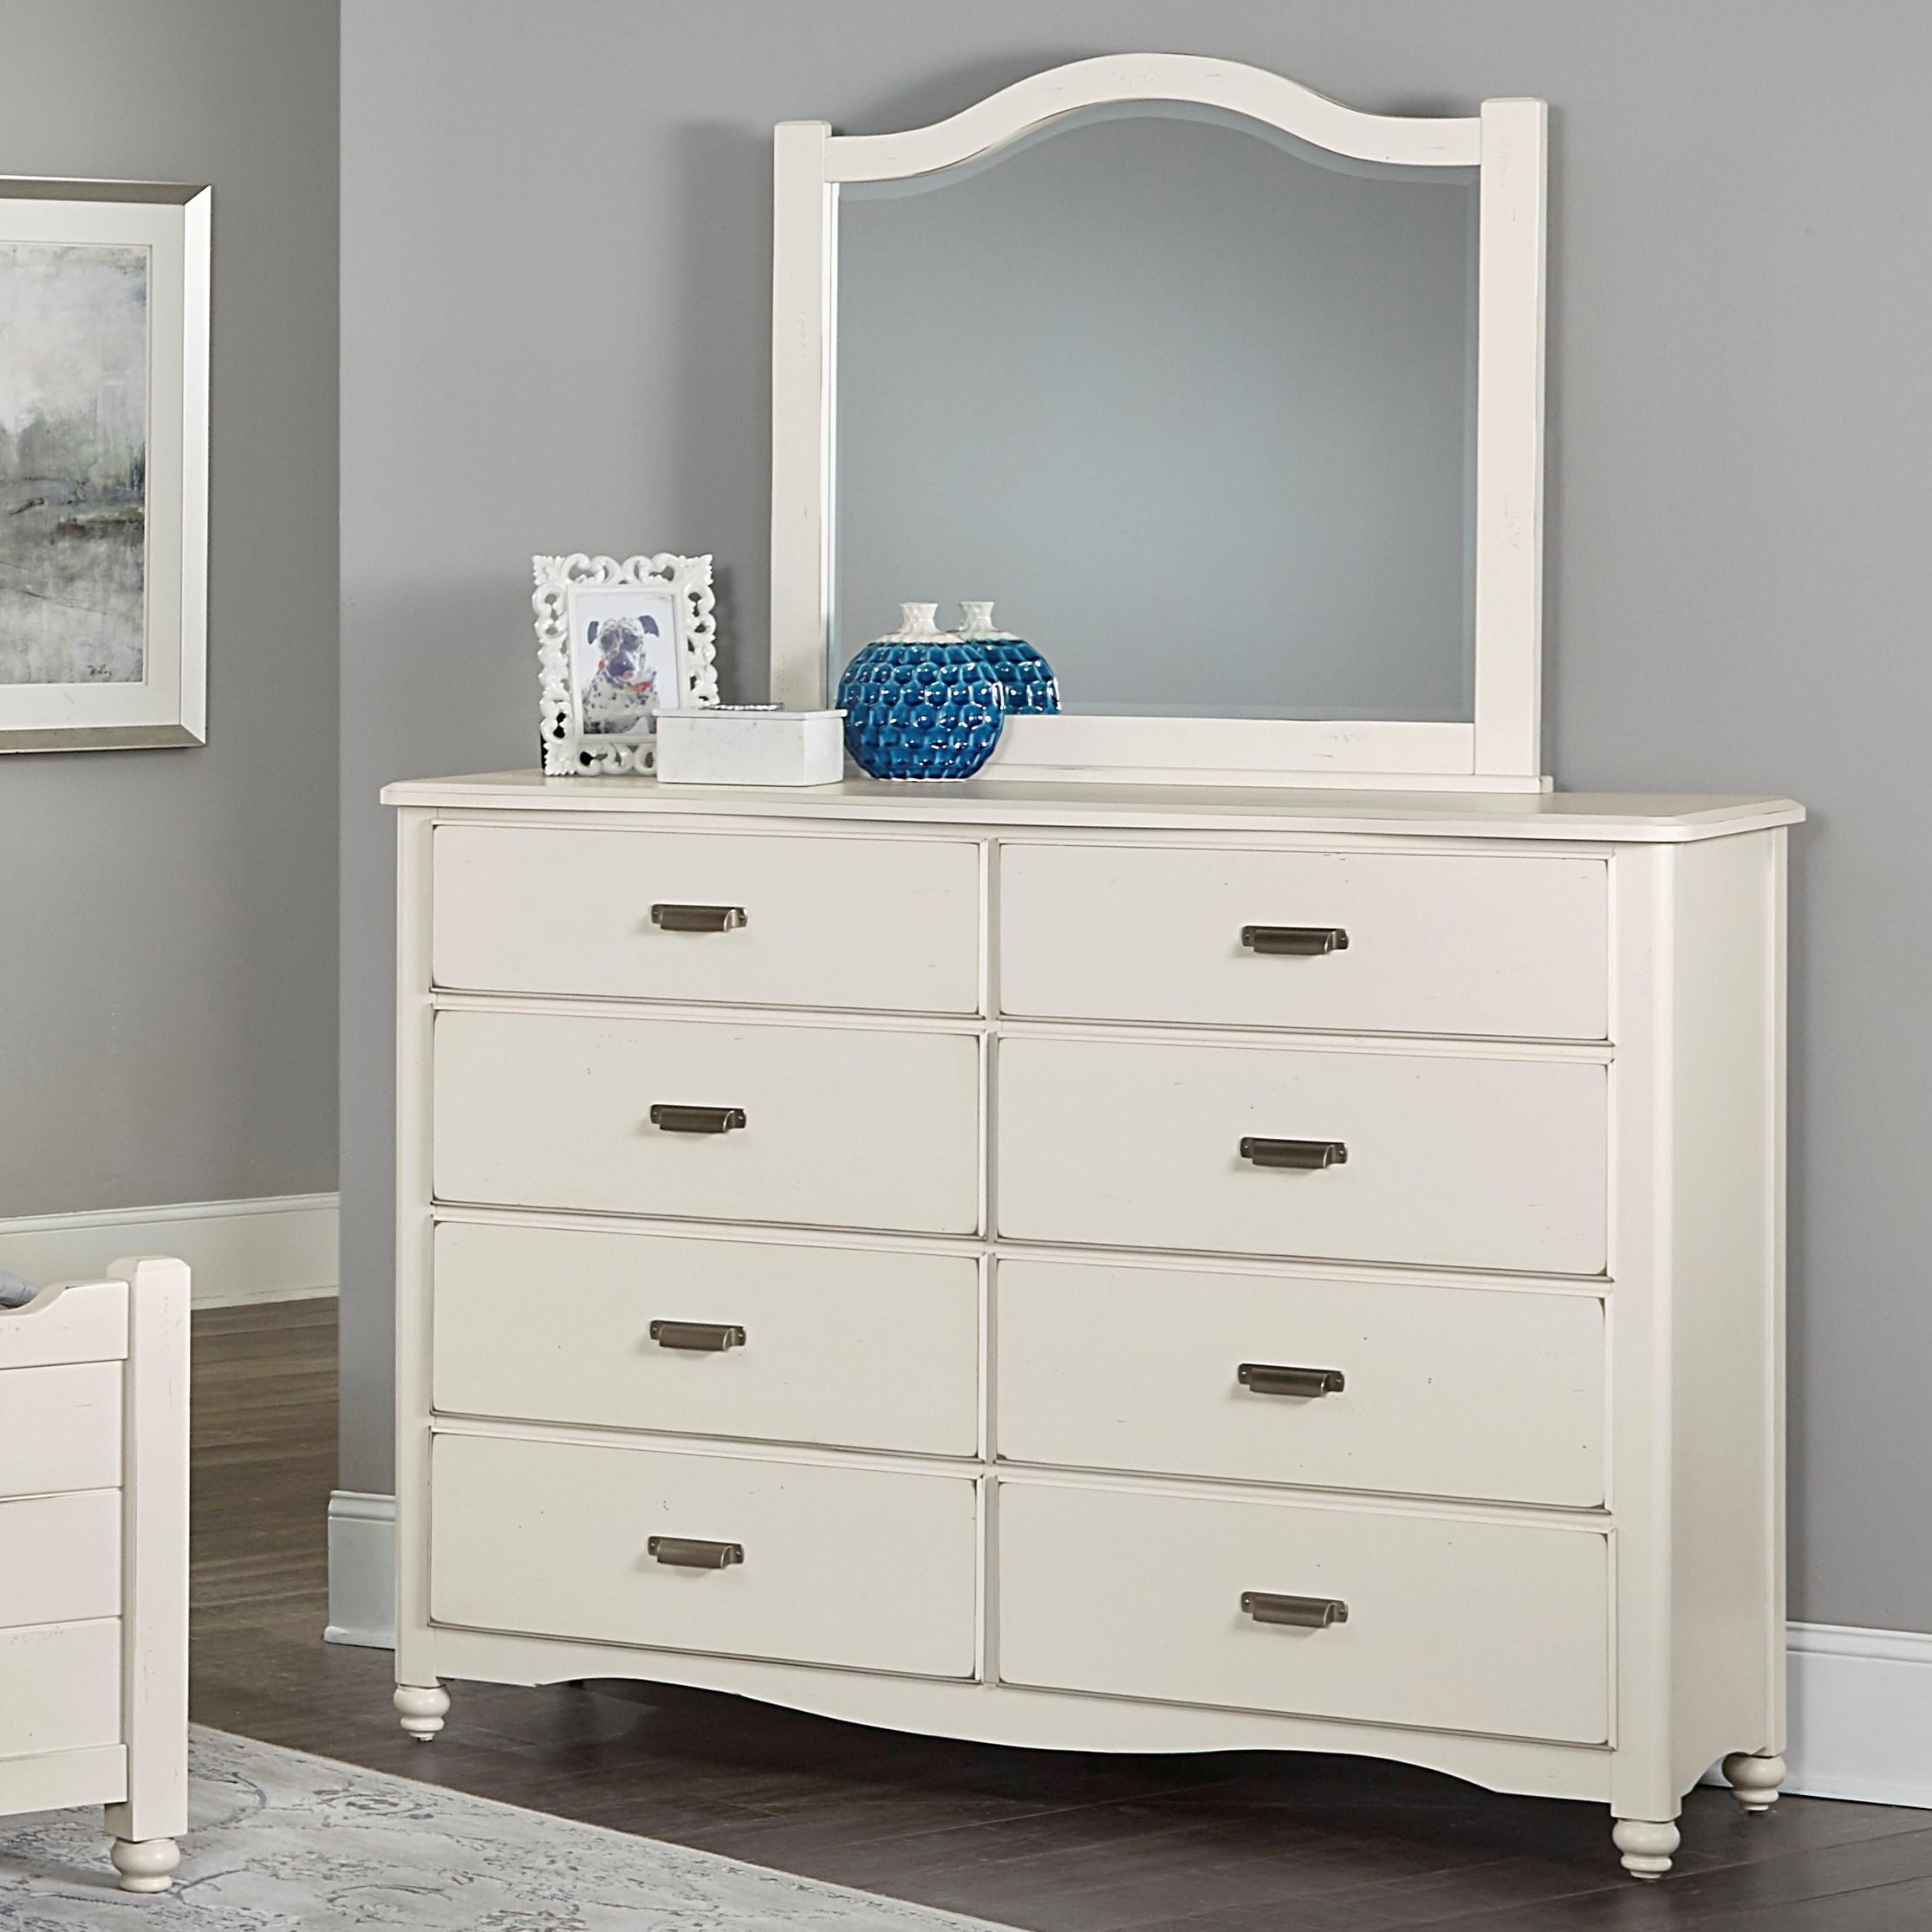 Vaughan Bassett American Maple Bureau & Arched Mirror - Item Number: 404-004+447